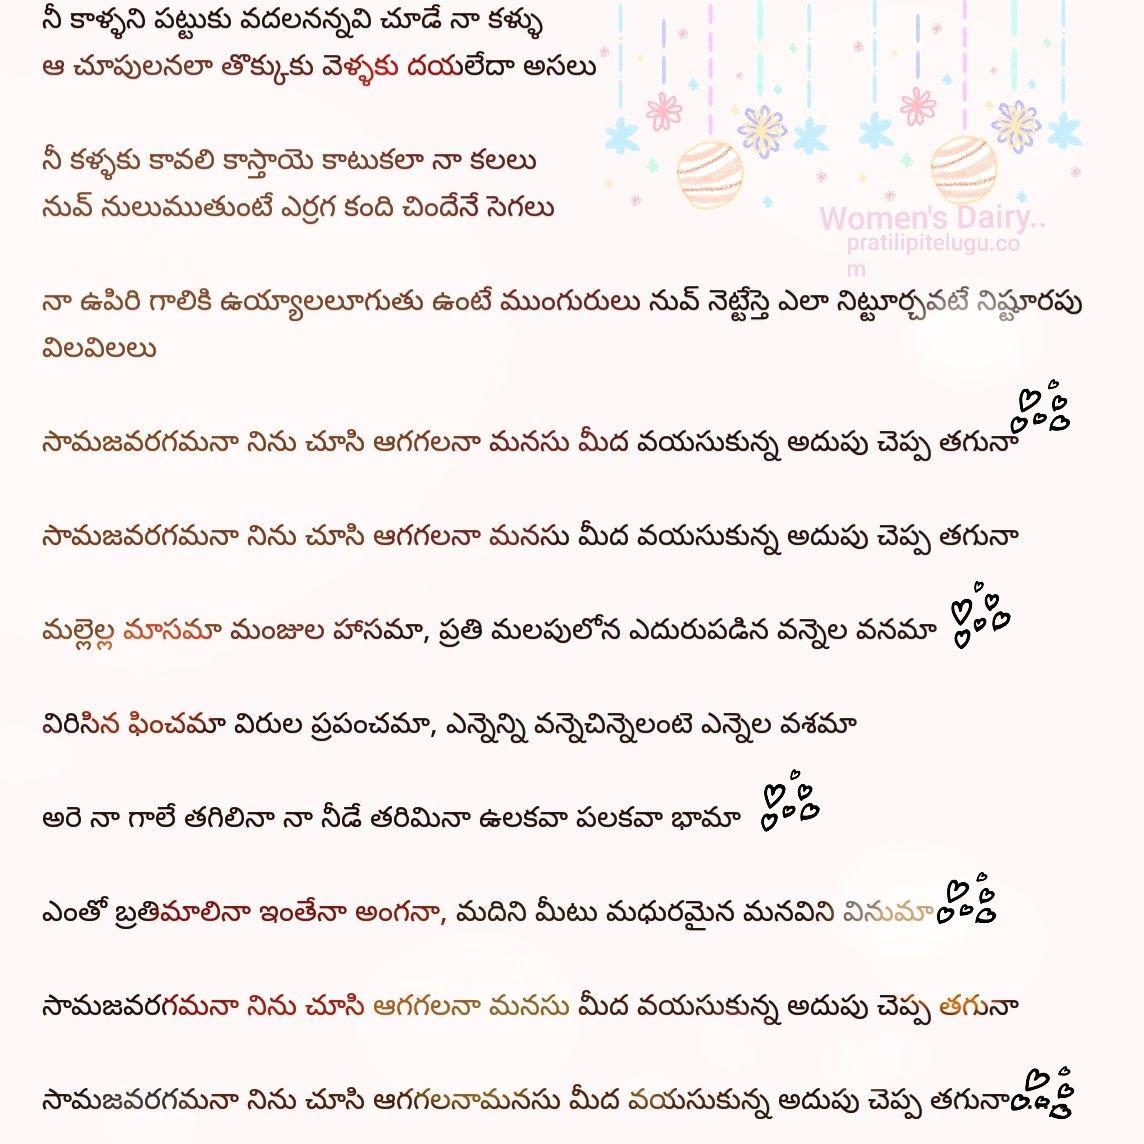 Samajavaragamana Song Lyrics In Telugu Read Story S In Telugu Pratilipitelugu Com Women S Dairy Song Lyrics Lyrics Movie Songs